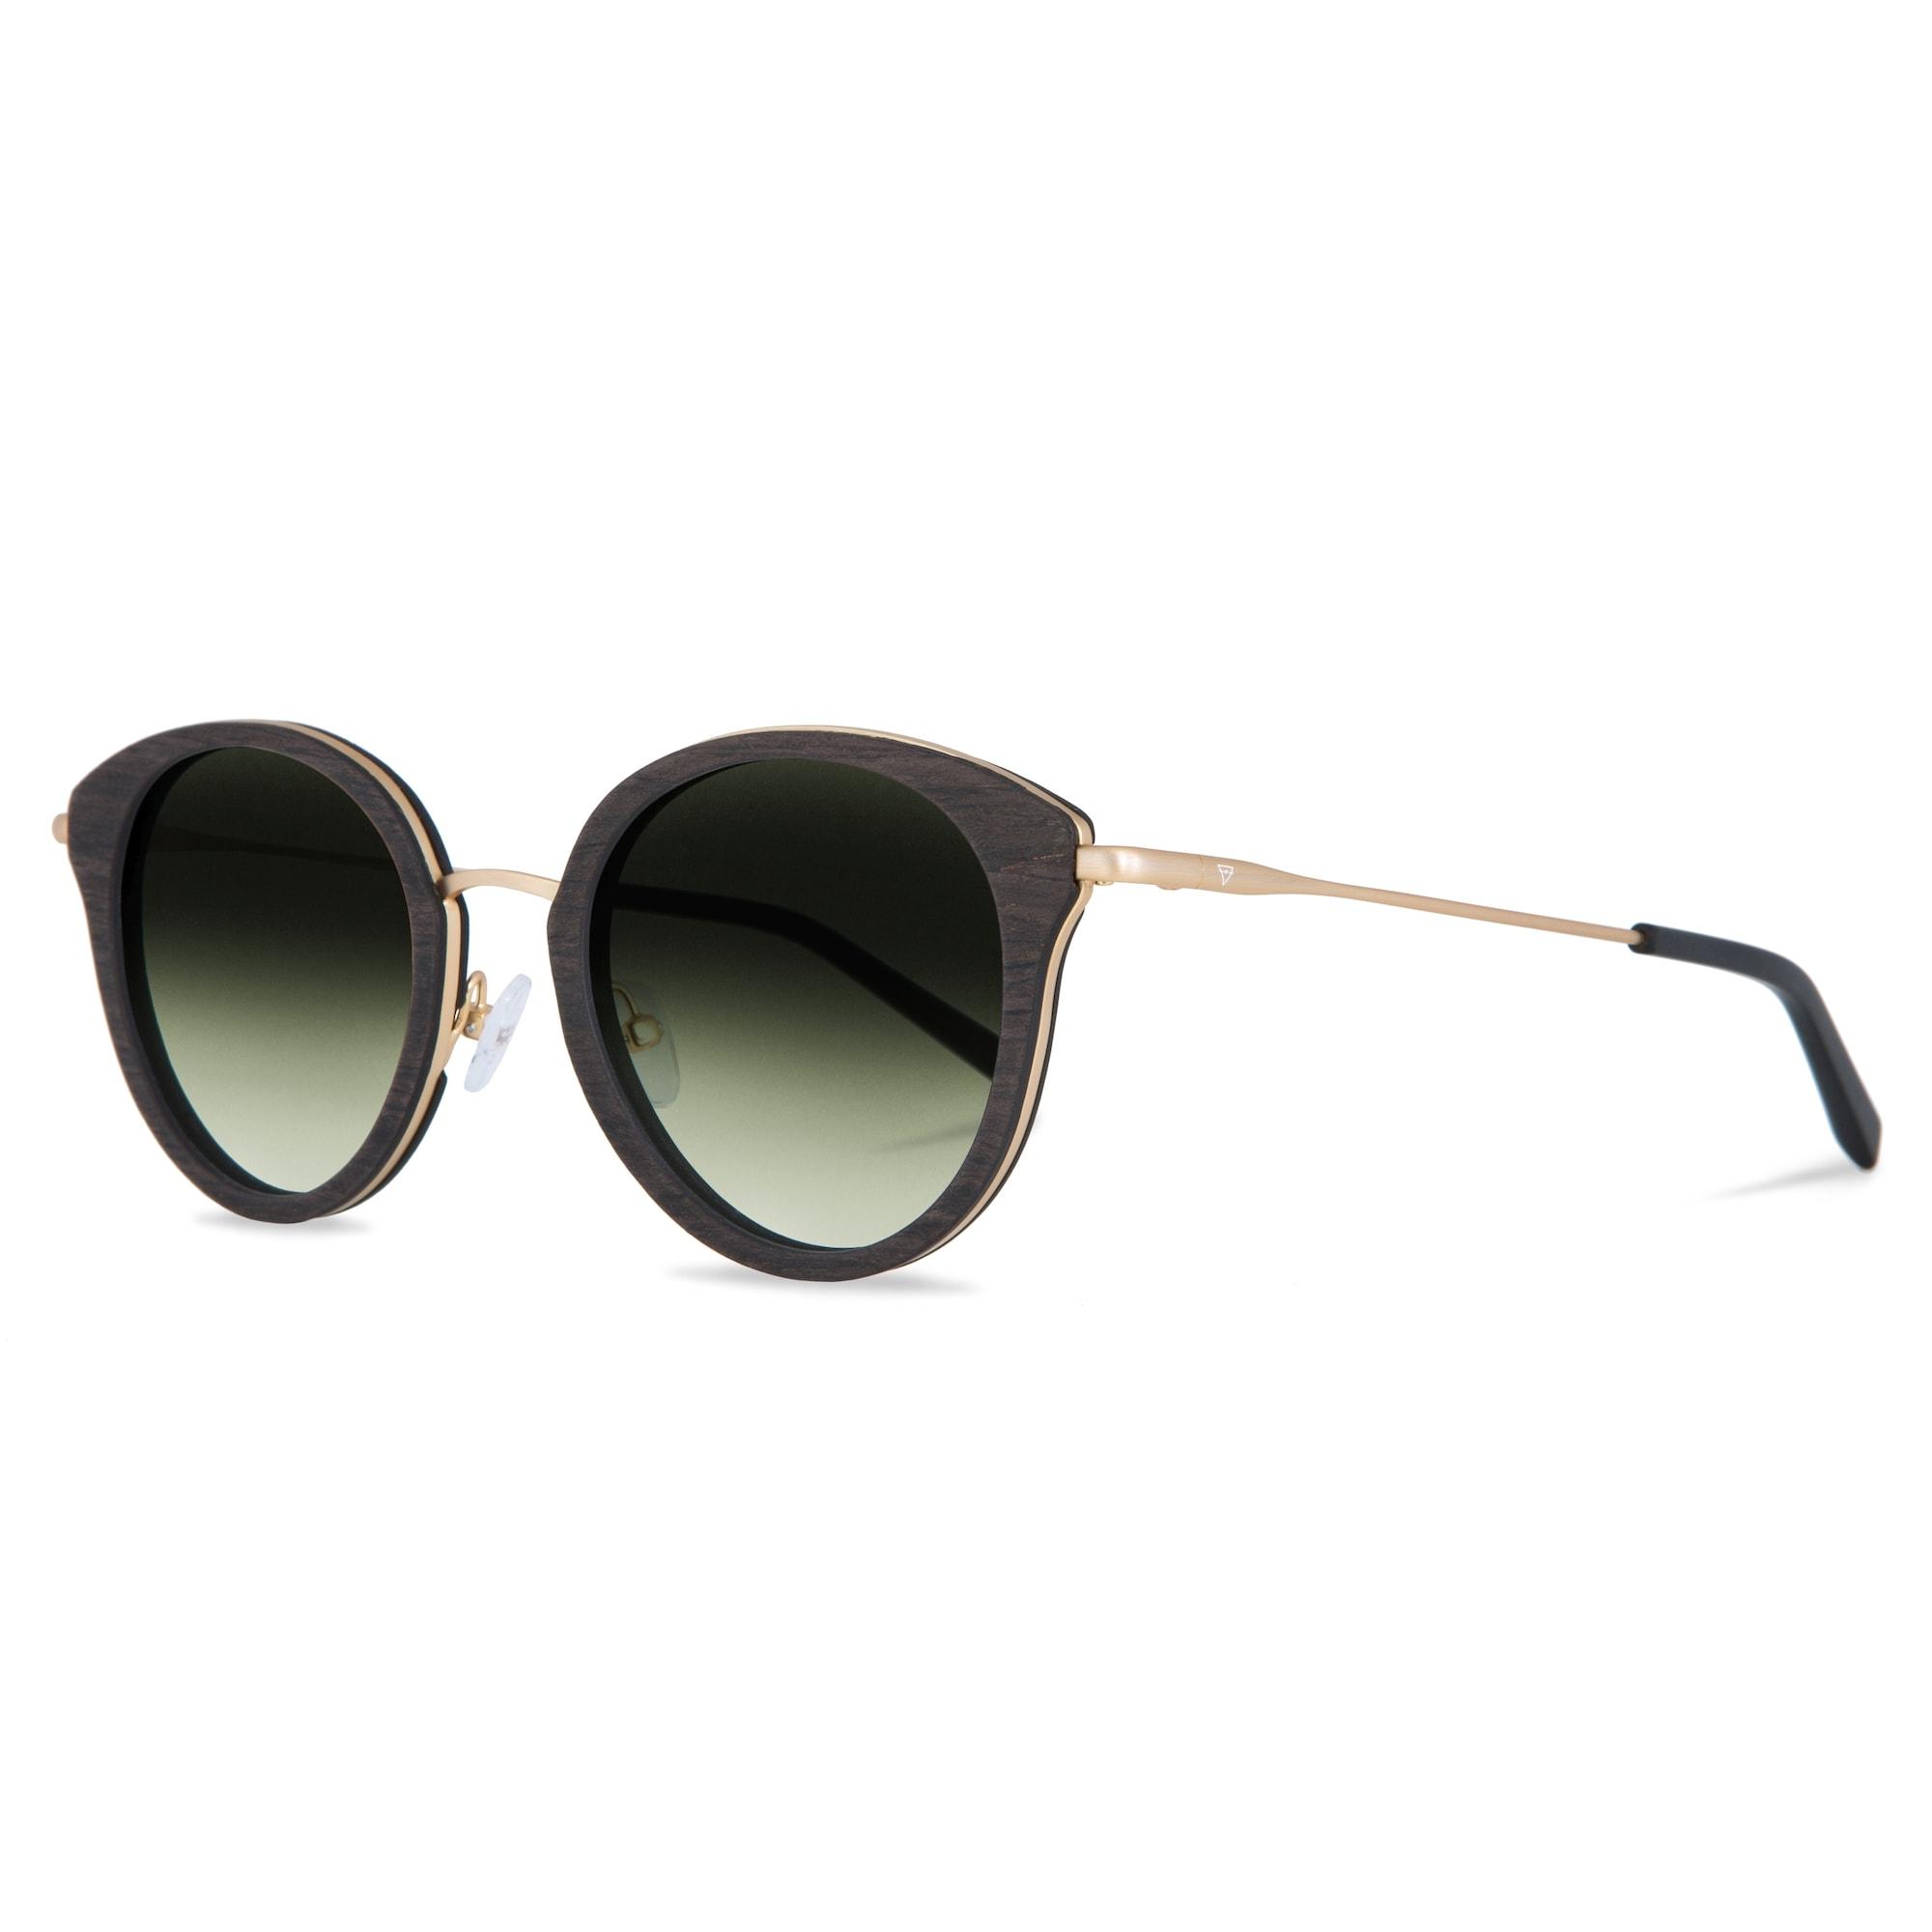 Sonnenbrille 'Wilhelmine' | Accessoires > Sonnenbrillen | Gold - Grün | Kerbholz